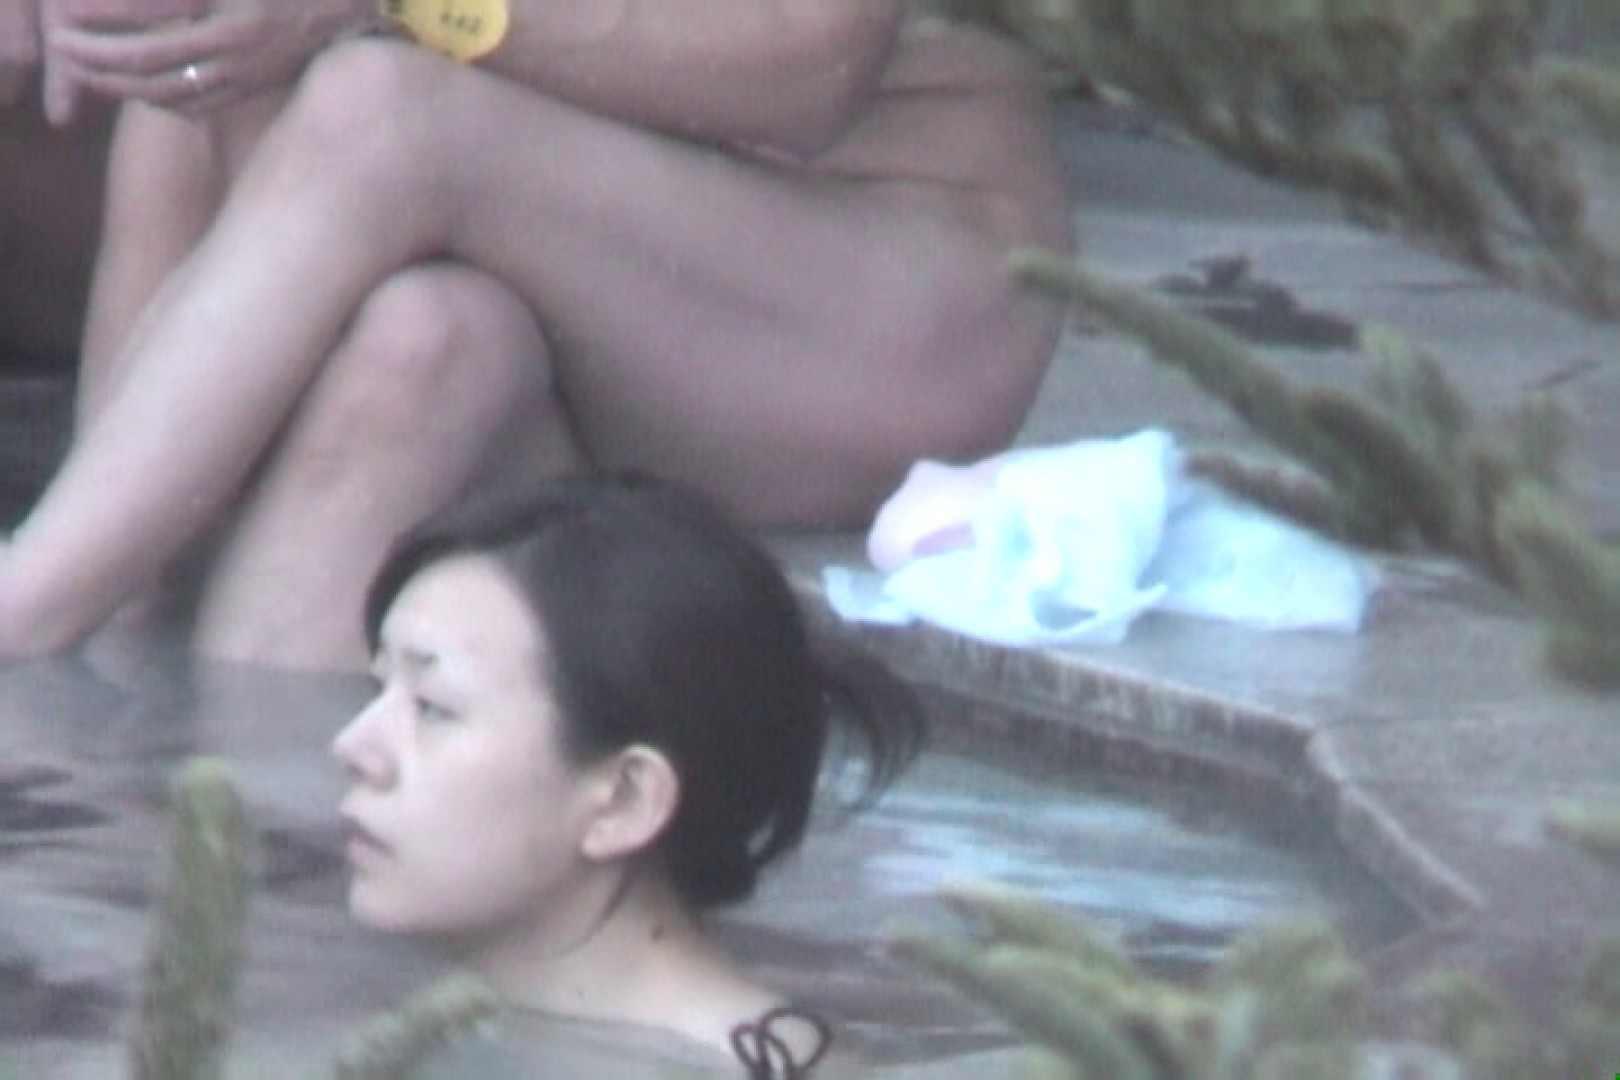 Aquaな露天風呂Vol.609 OLのプライベート  11pic 3